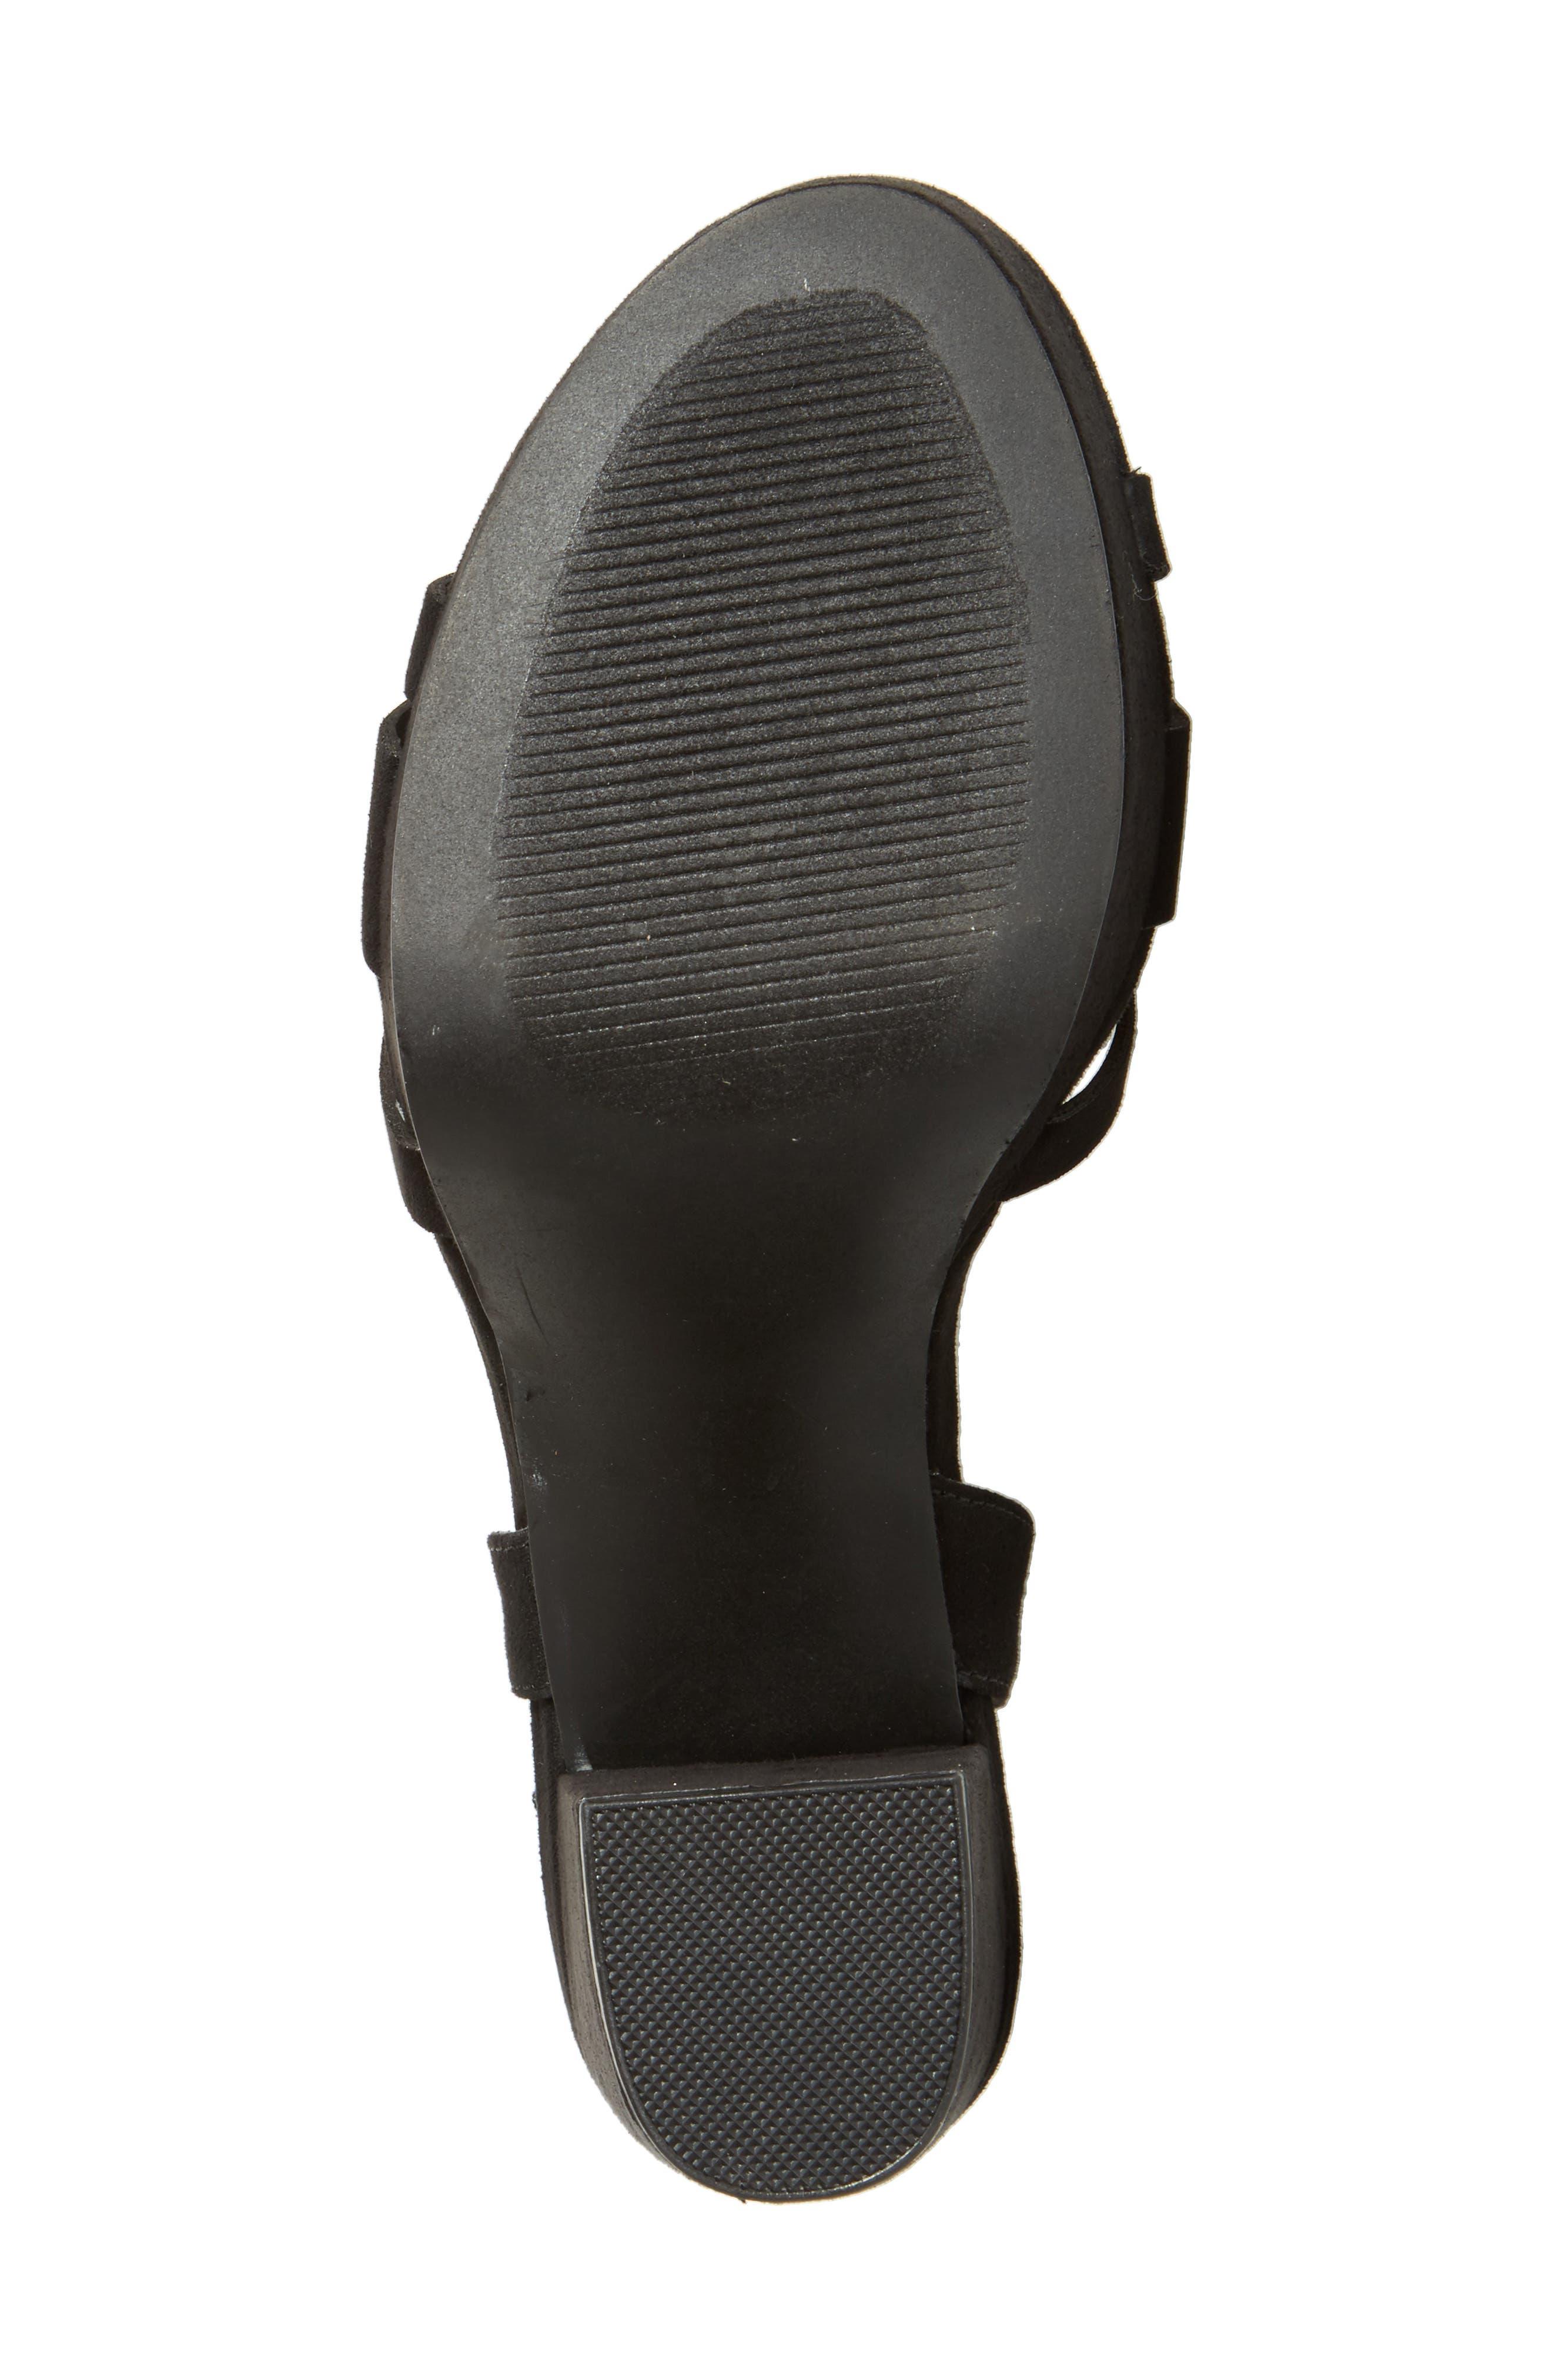 Paxx Platform Sandal,                             Alternate thumbnail 6, color,                             003